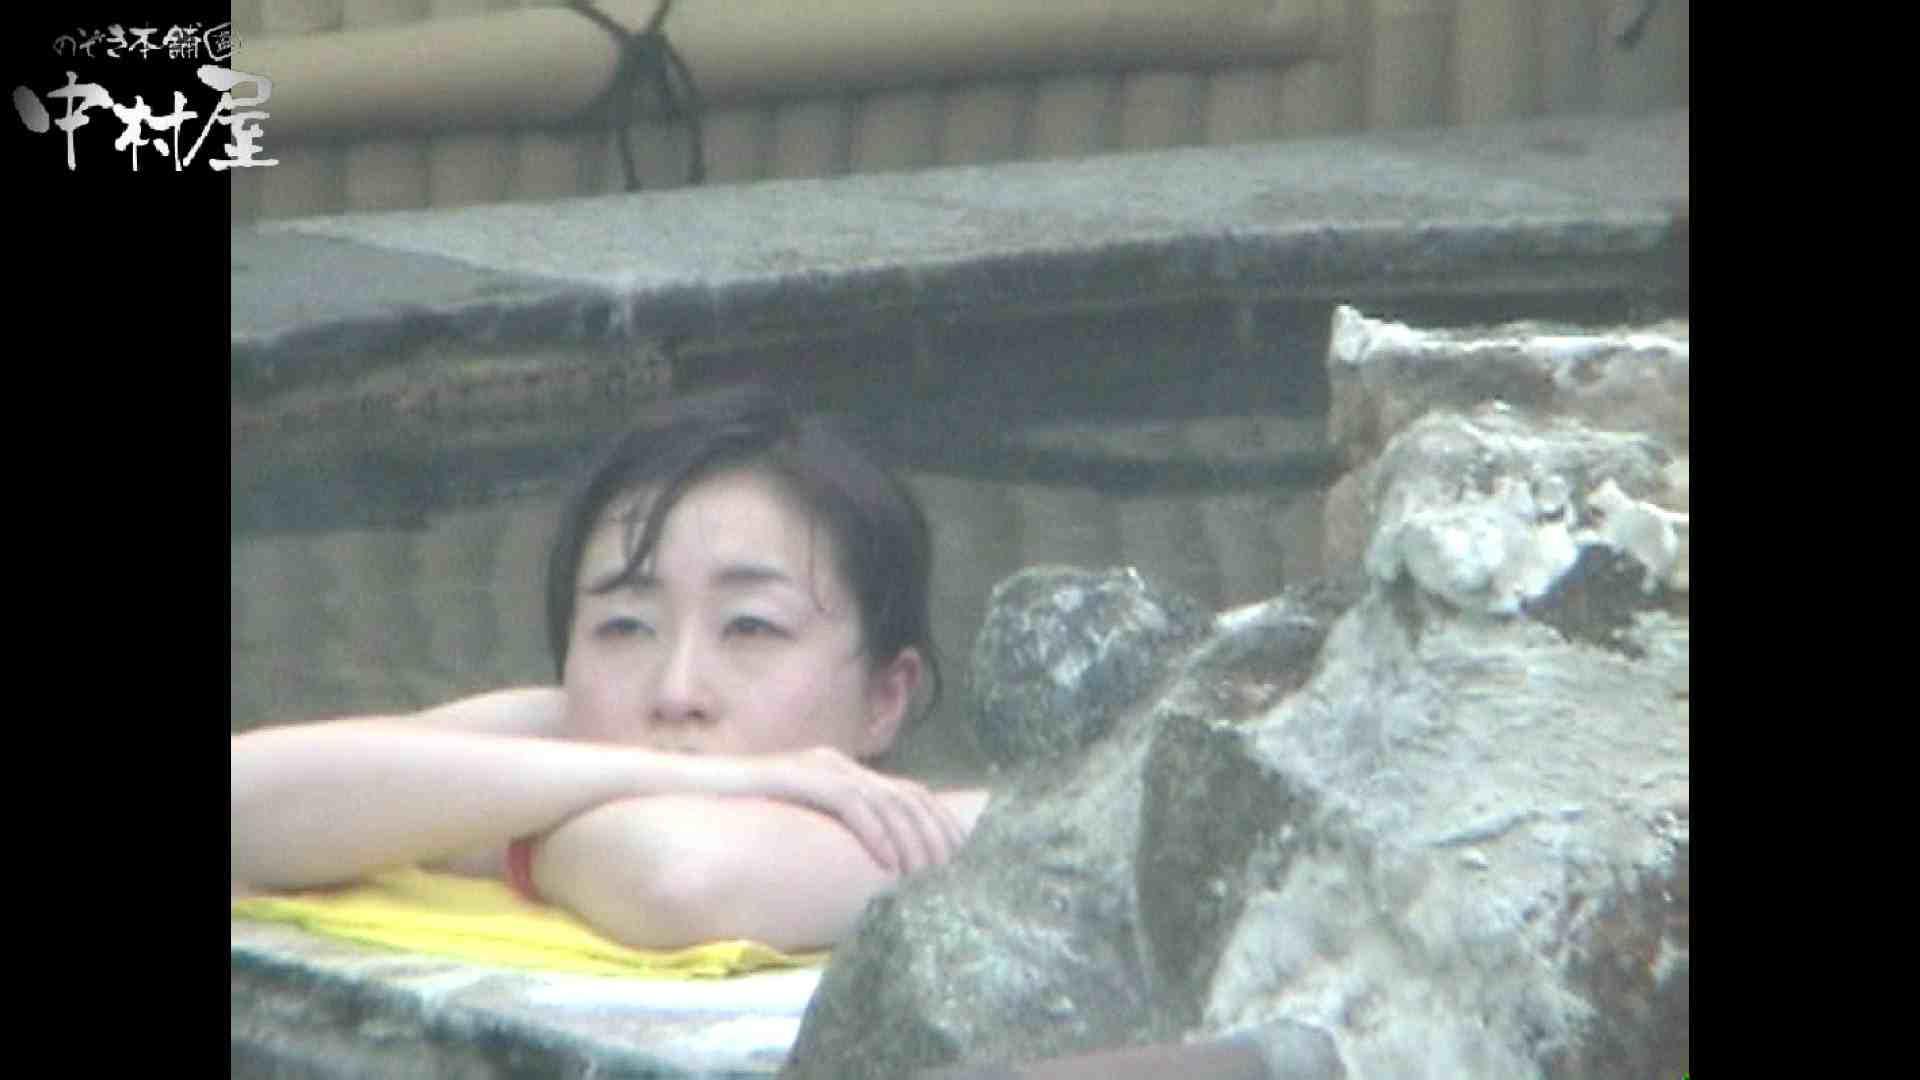 Aquaな露天風呂Vol.957 盗撮シリーズ | 露天風呂編  110PIX 9